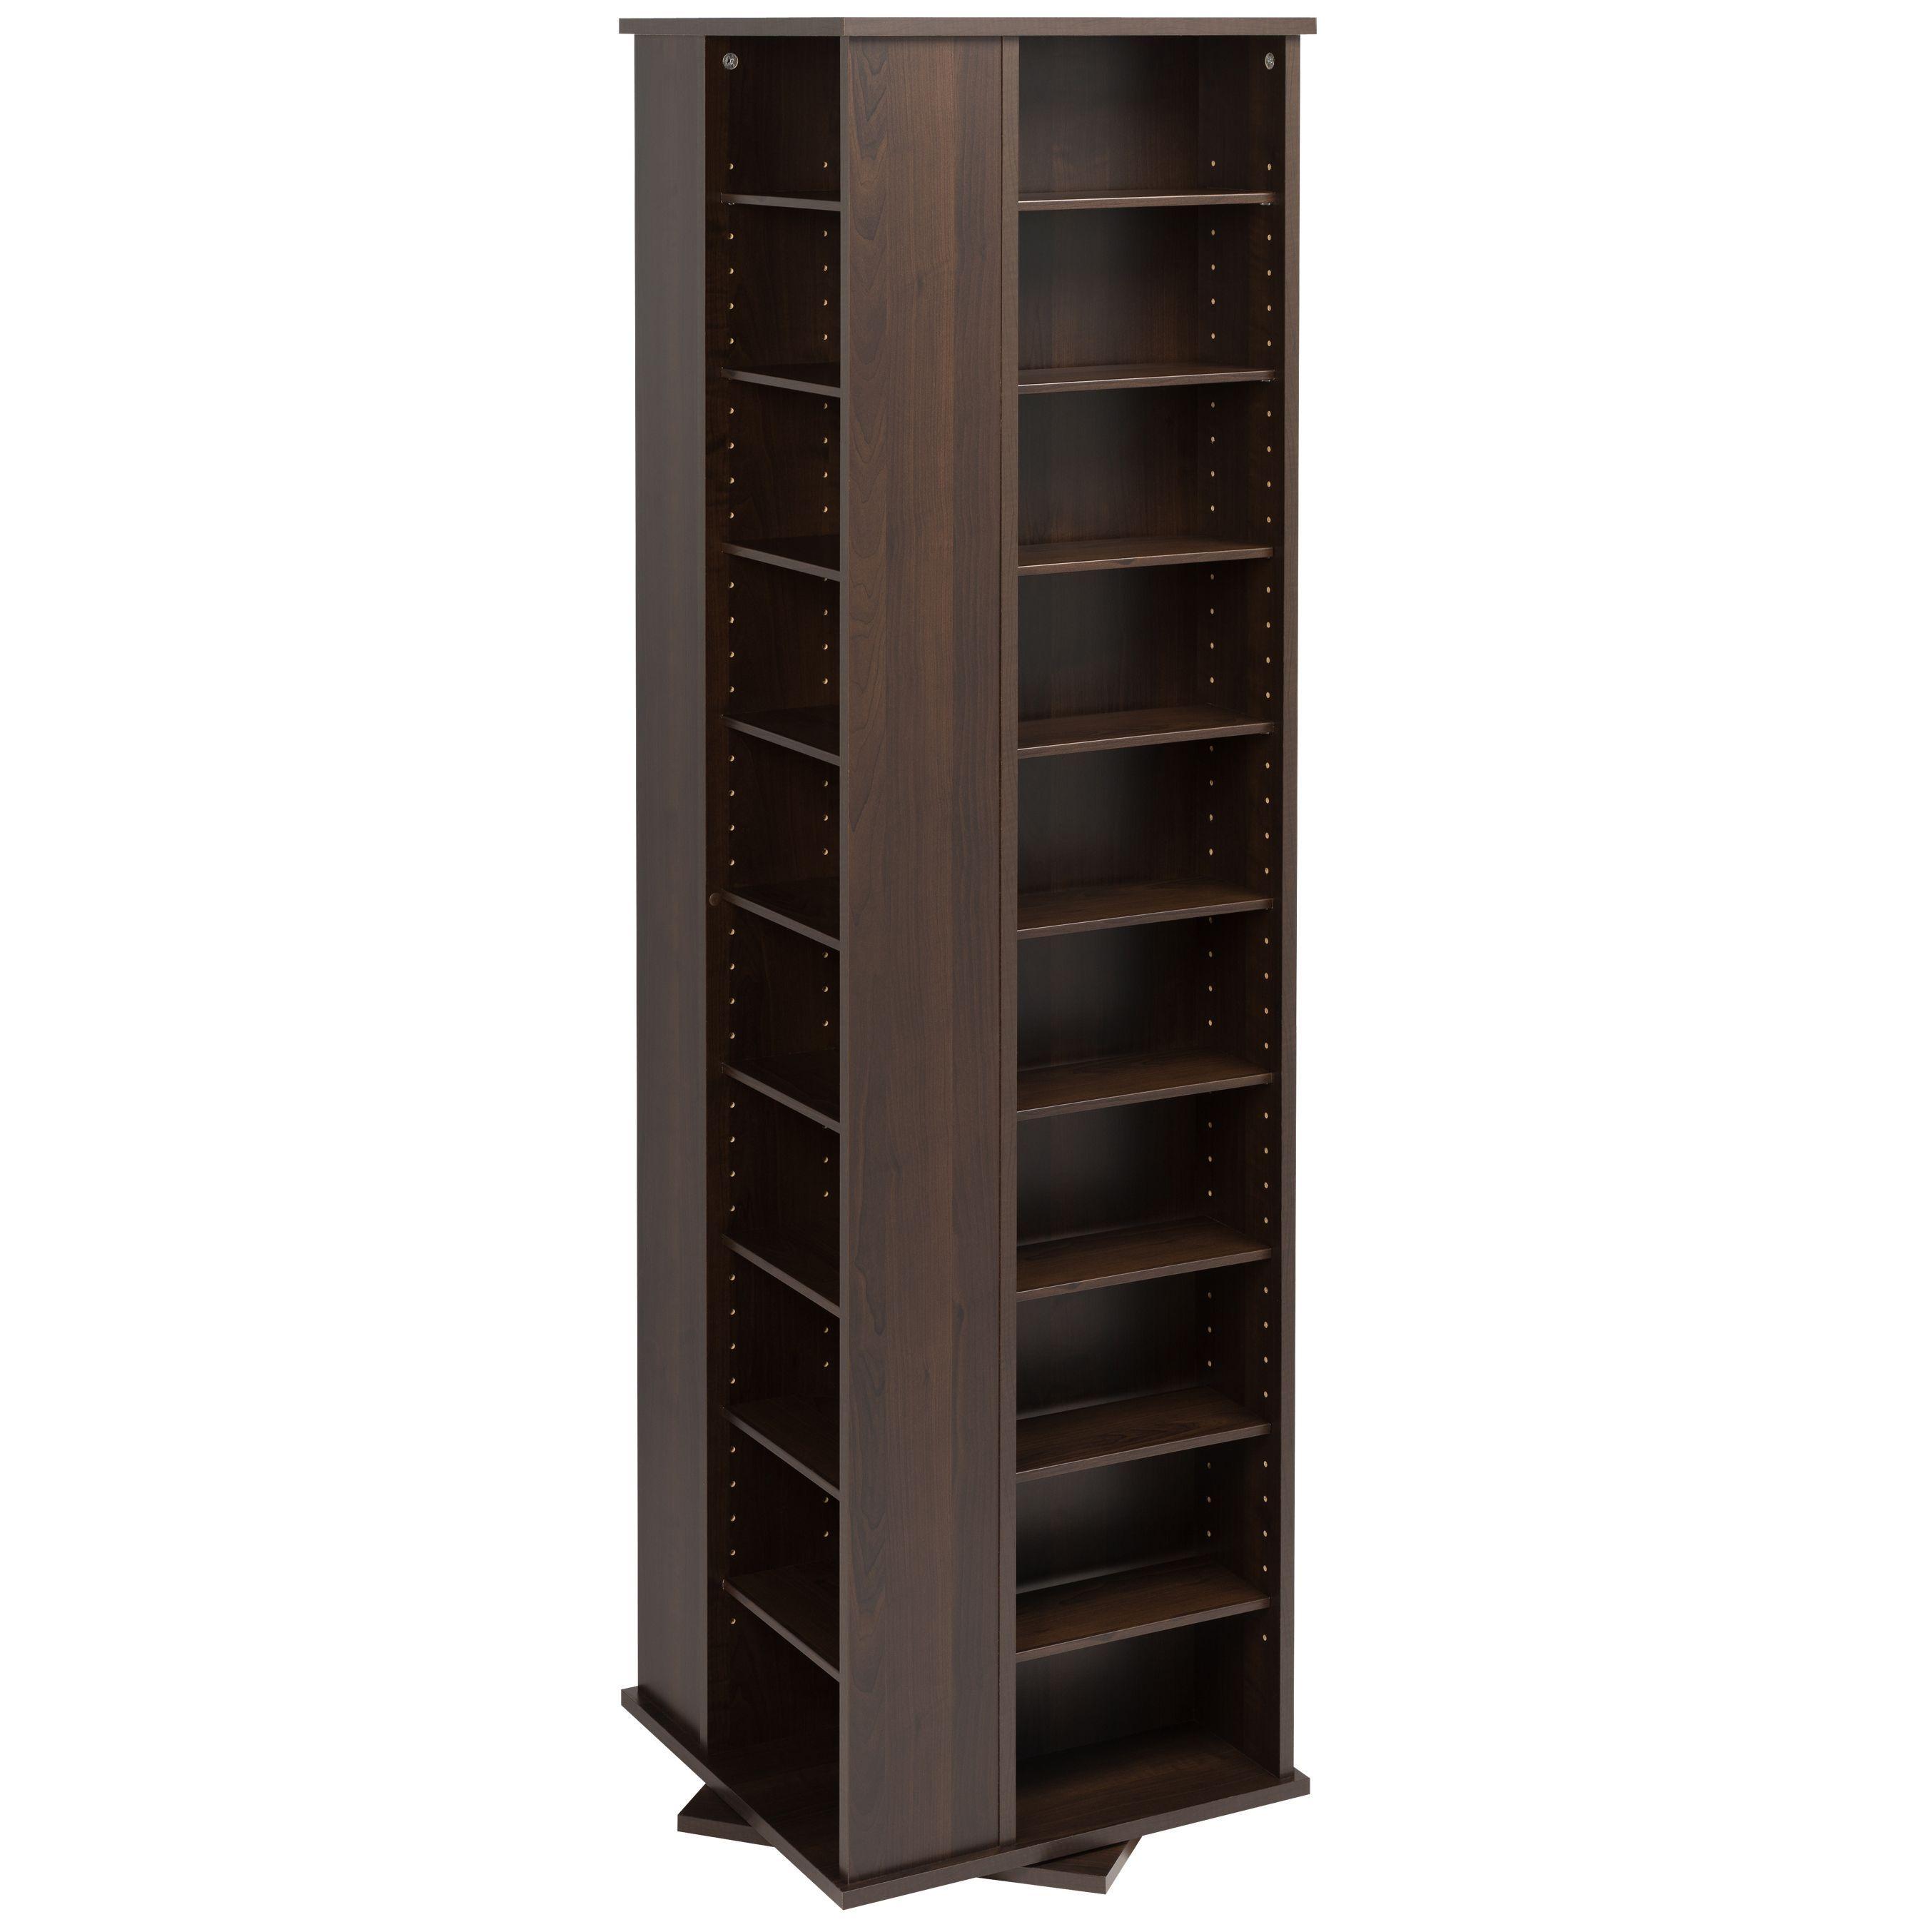 Prepac Everett Espresso 4 Sided Spinner Media Storage Cabinet